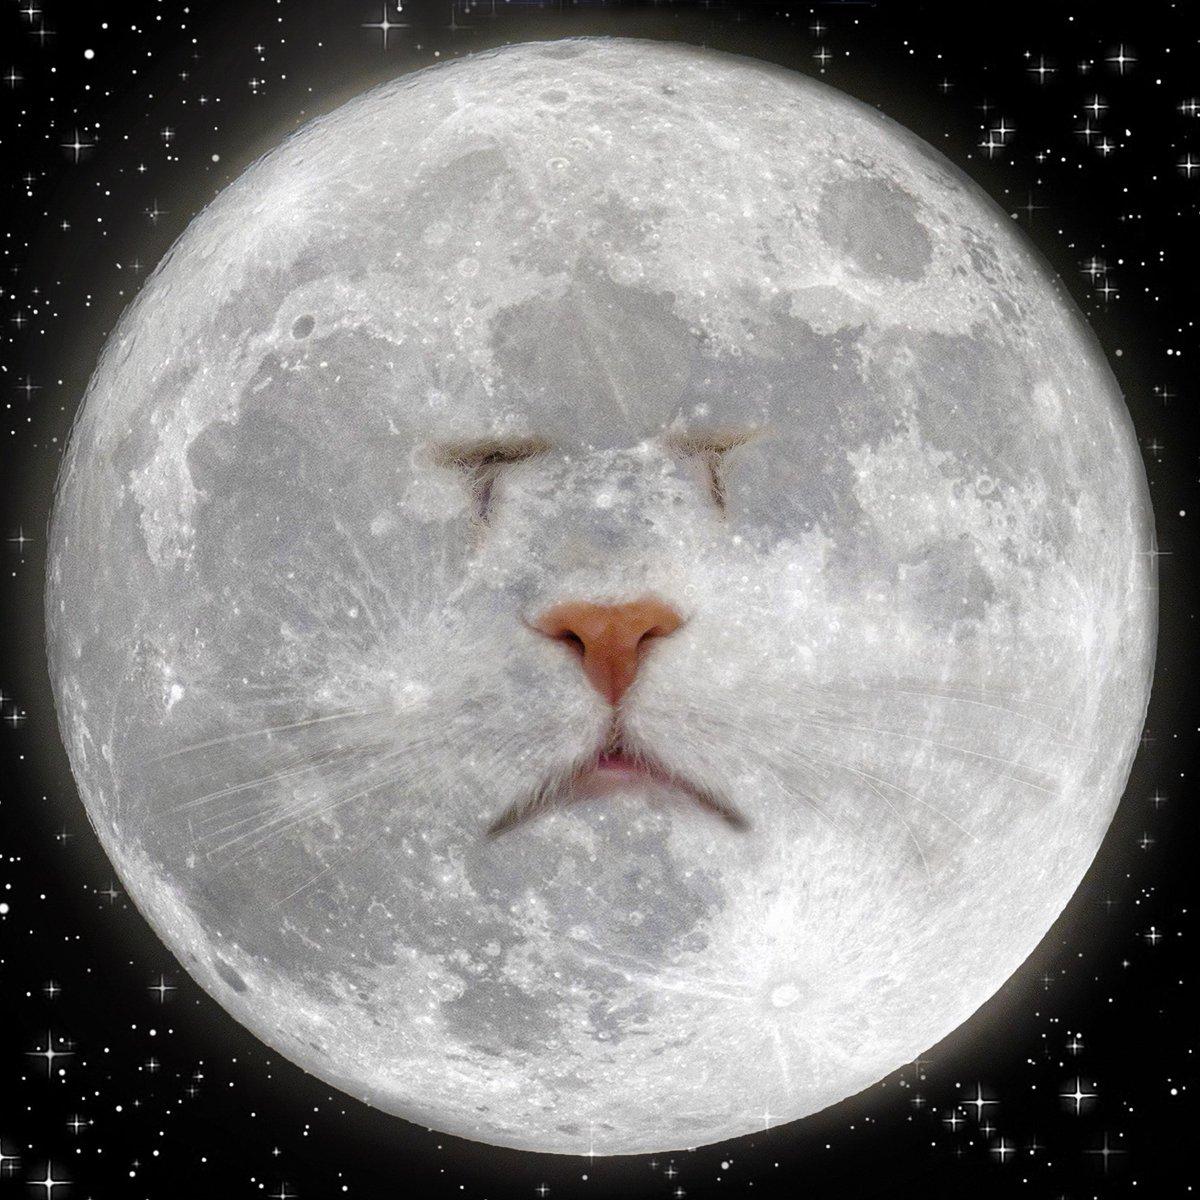 Moet in the moon 🌚 Happy Sunday funday!  #sundayvibes #CatsOfTwitter #AnimalCrossingNewHorizons https://t.co/1FTmyd9Spb